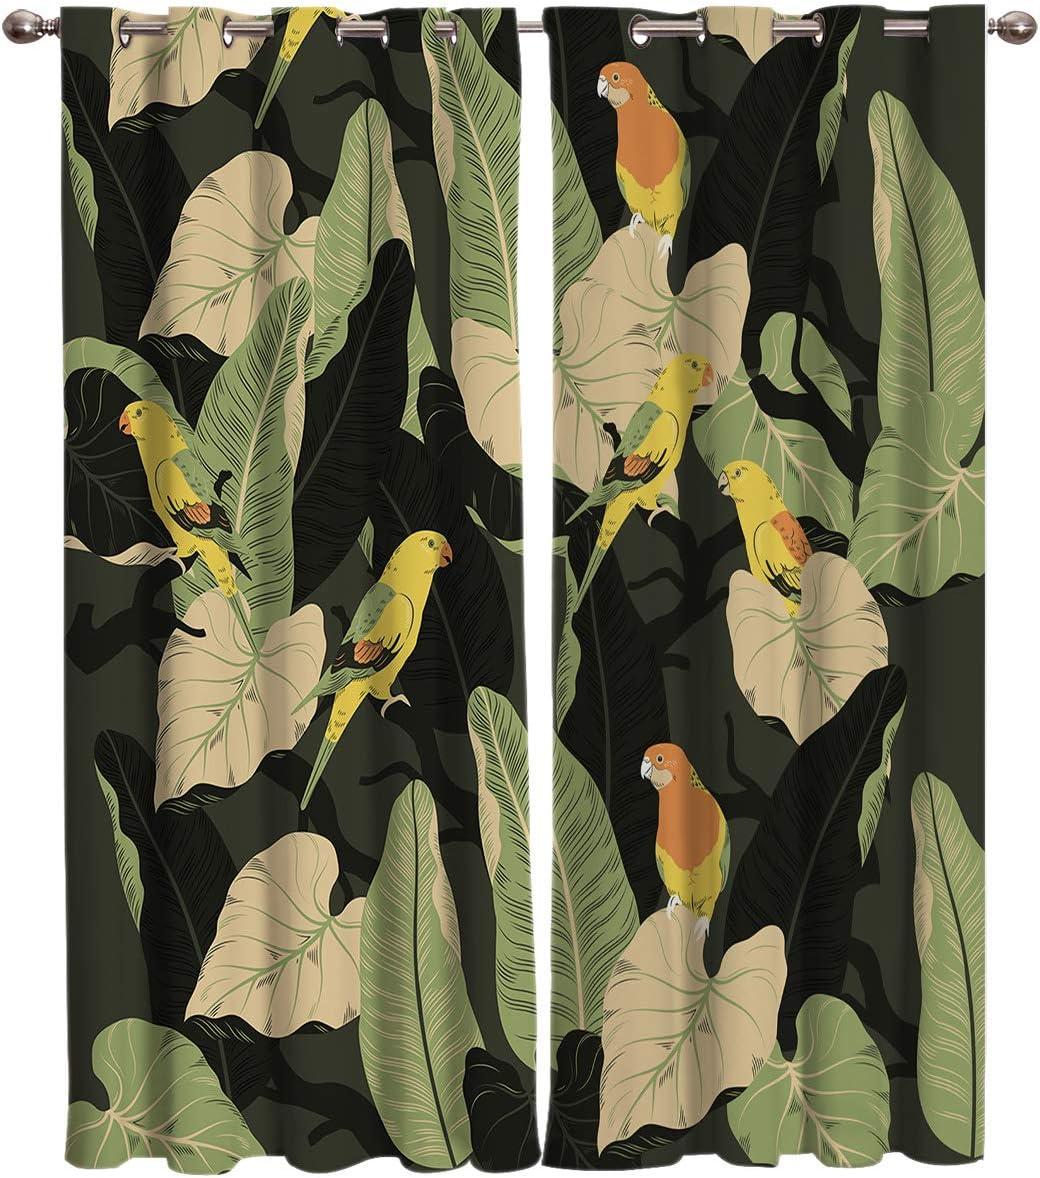 TH Home Curtain Panel for Bedroom Summ Door 直営ストア Patio 訳あり Living Room -